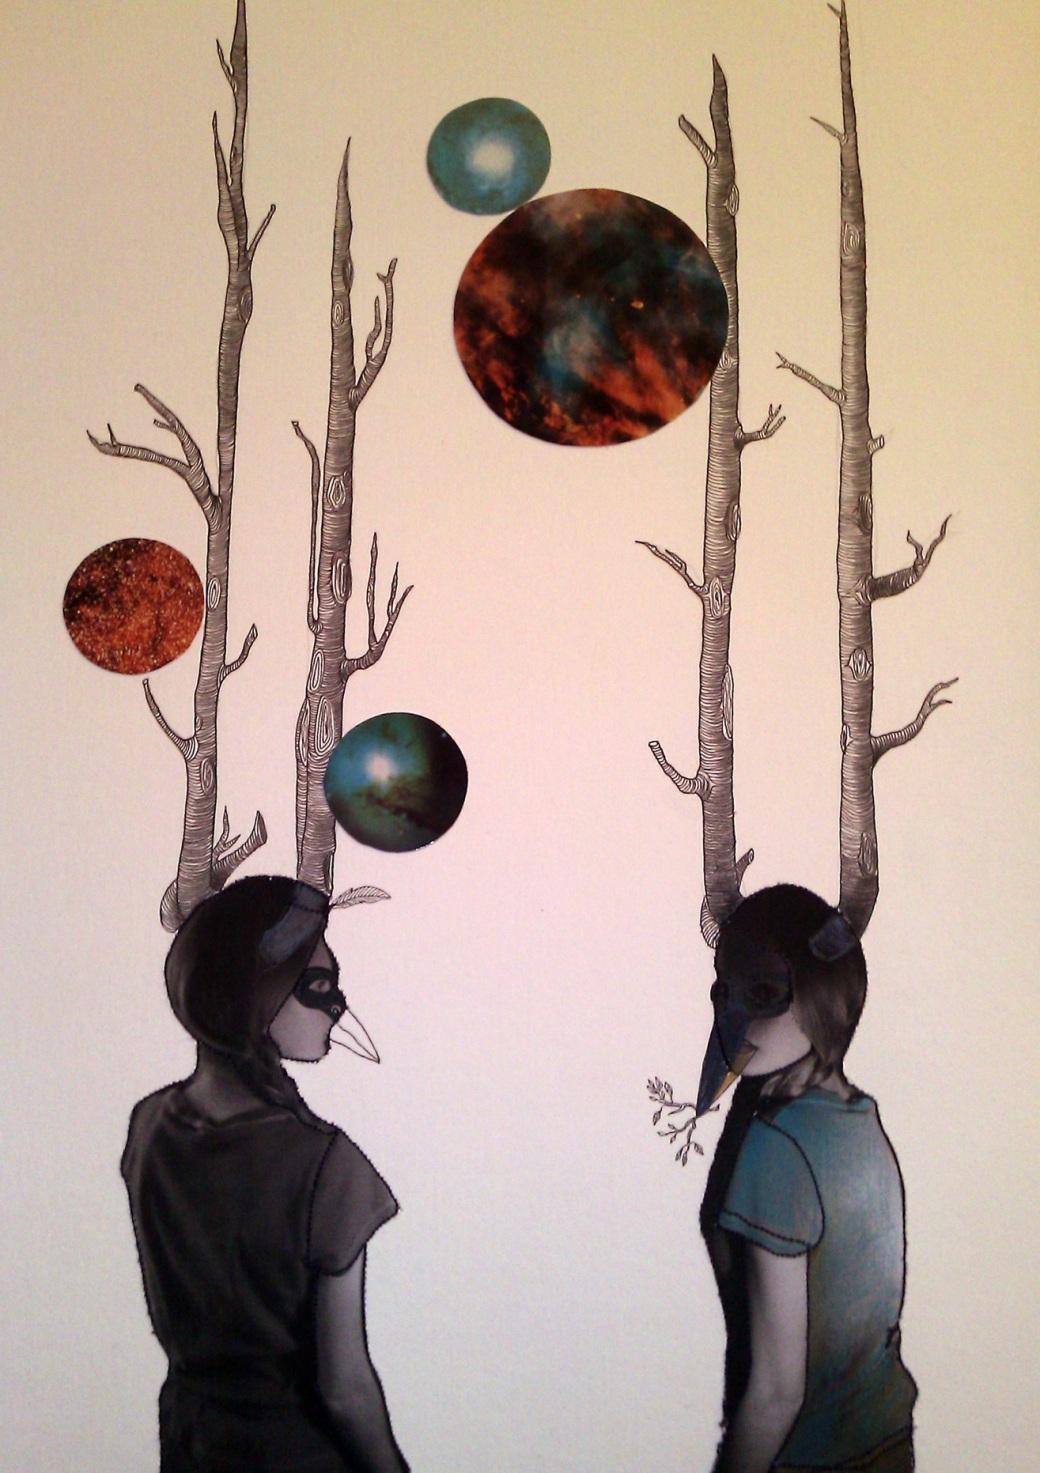 Magica dualidad